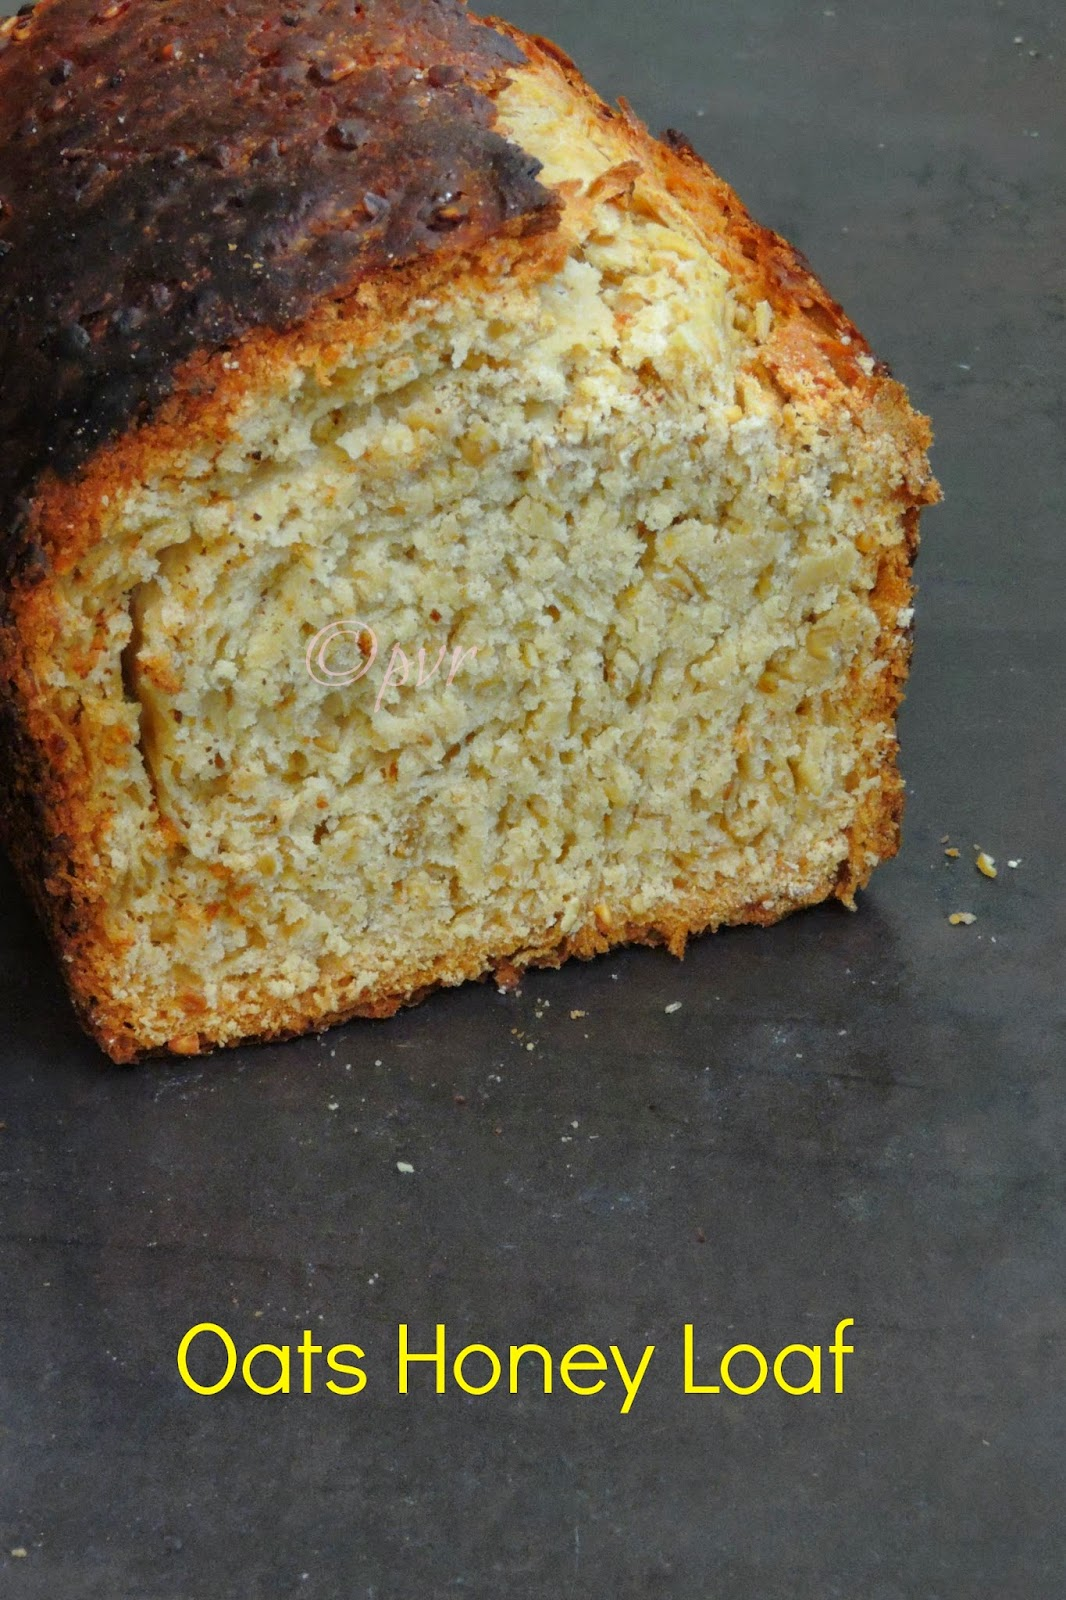 Oats Honey Loaf, Oats Honey Bread, Quick honey bread